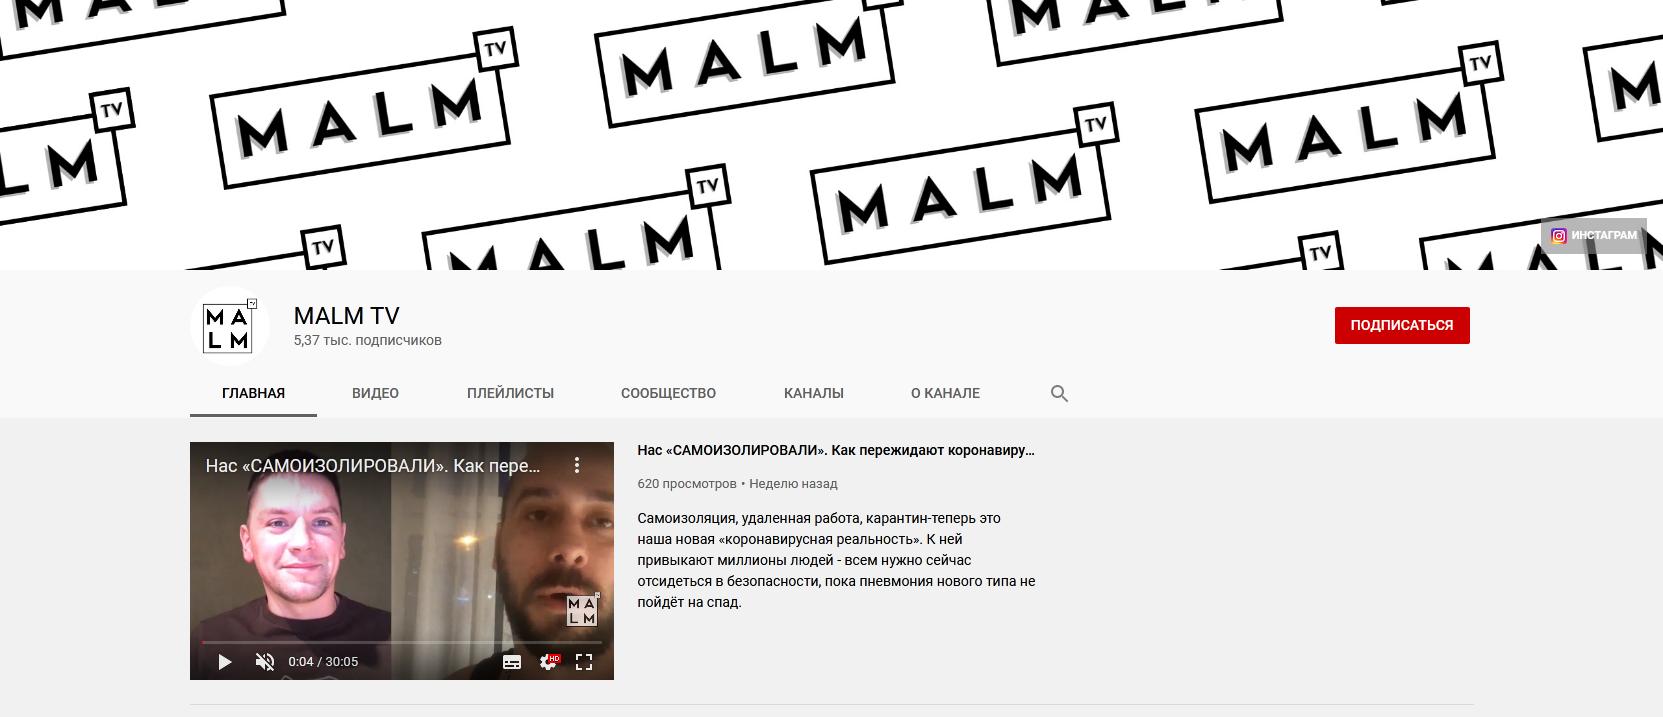 Александр Мальм: биография, личная жизнь, жена, дети